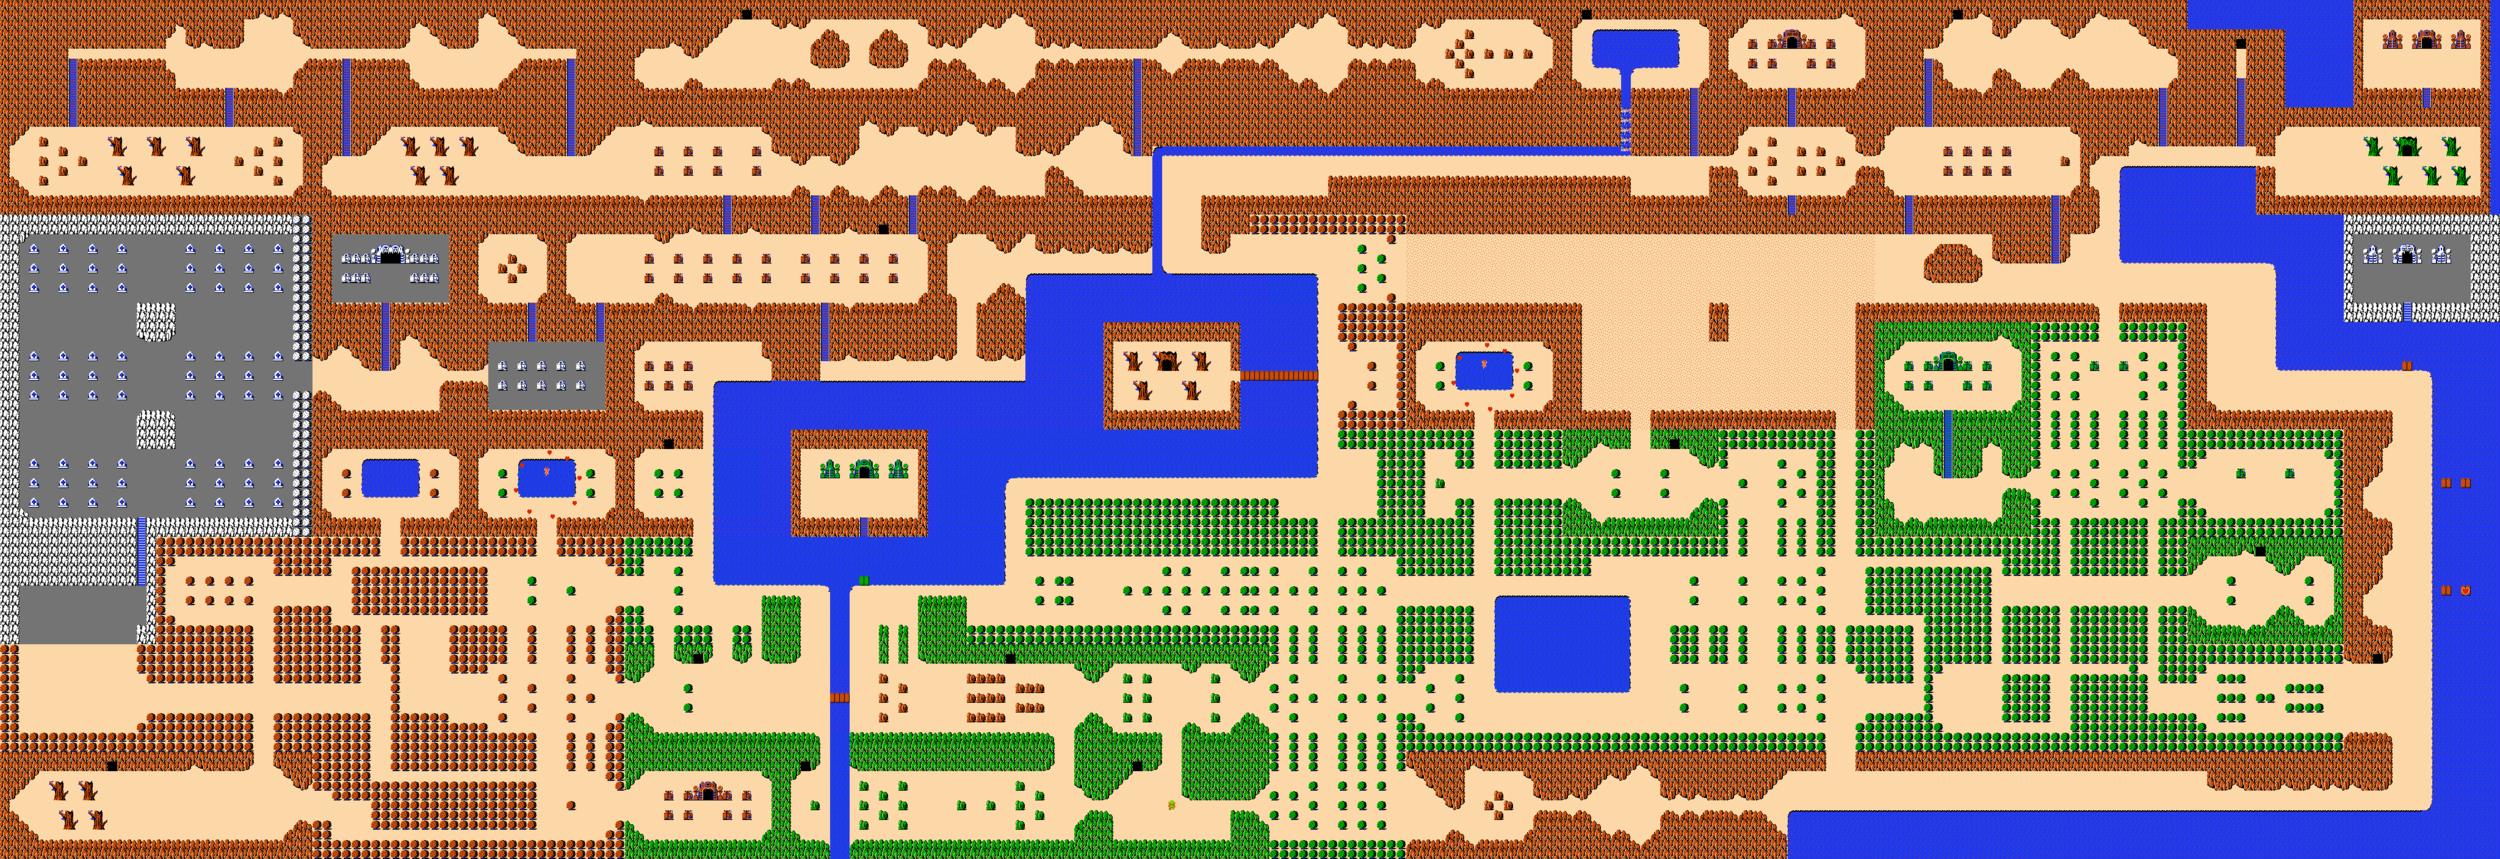 The entire Legend of Zelda overworld.